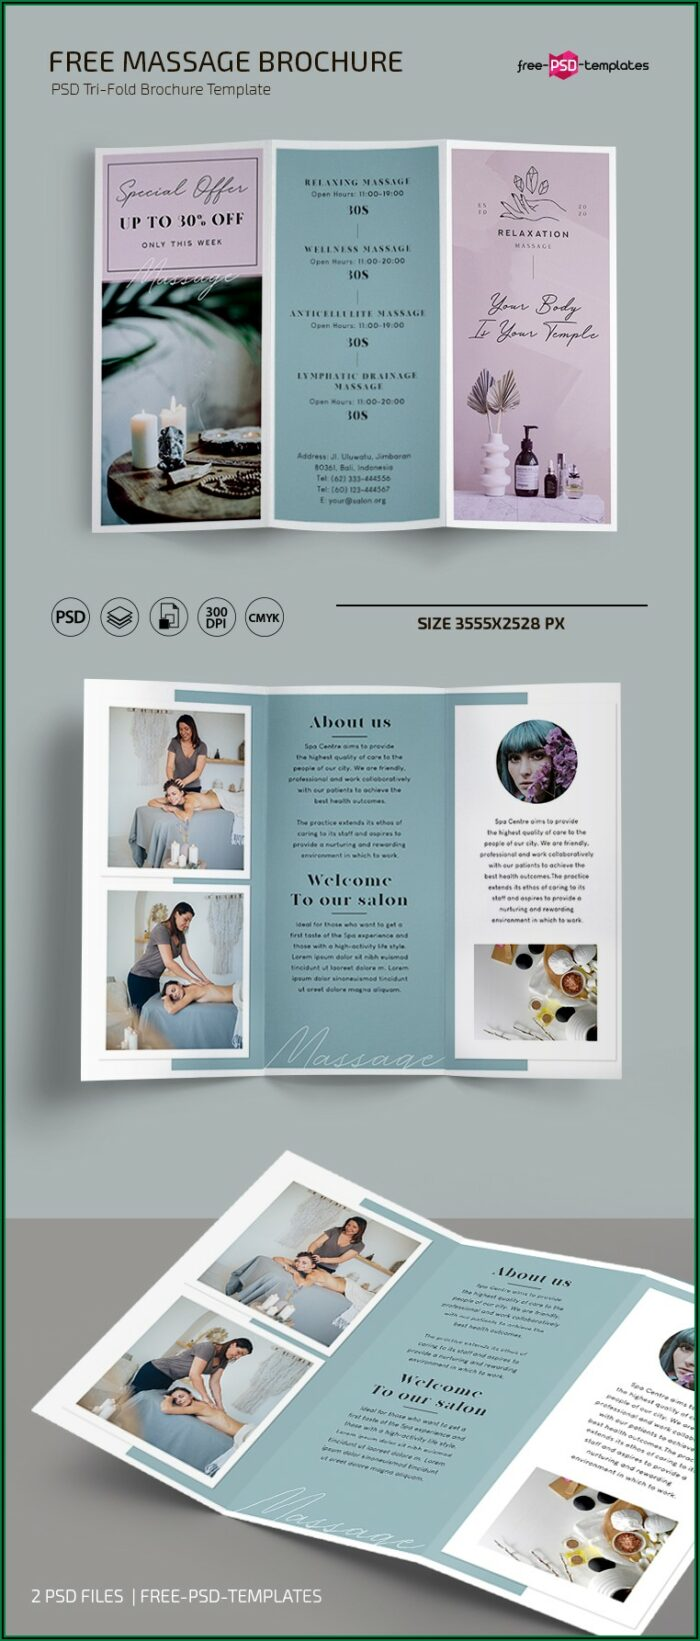 Massage Brochure Templates Free